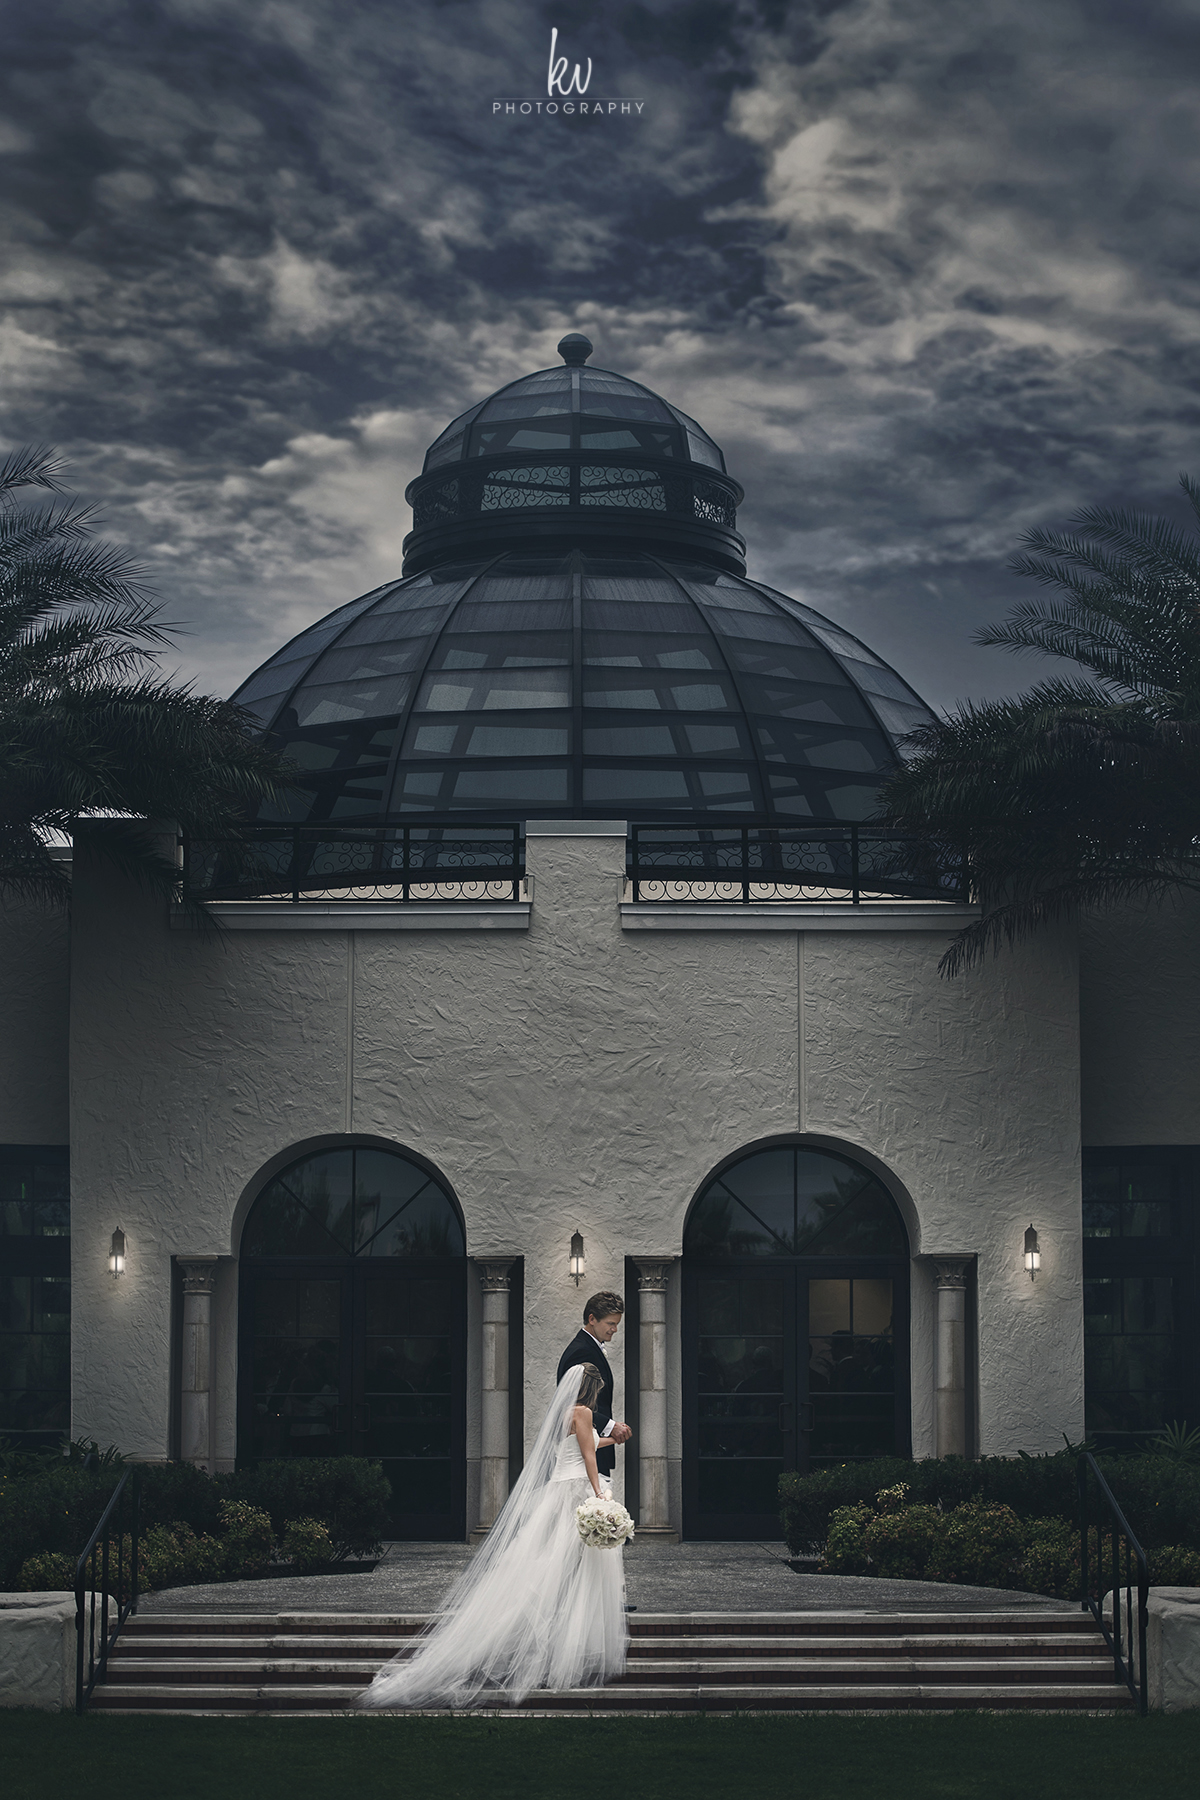 032-alfond-inn-wedding-photography-xp-winter-park